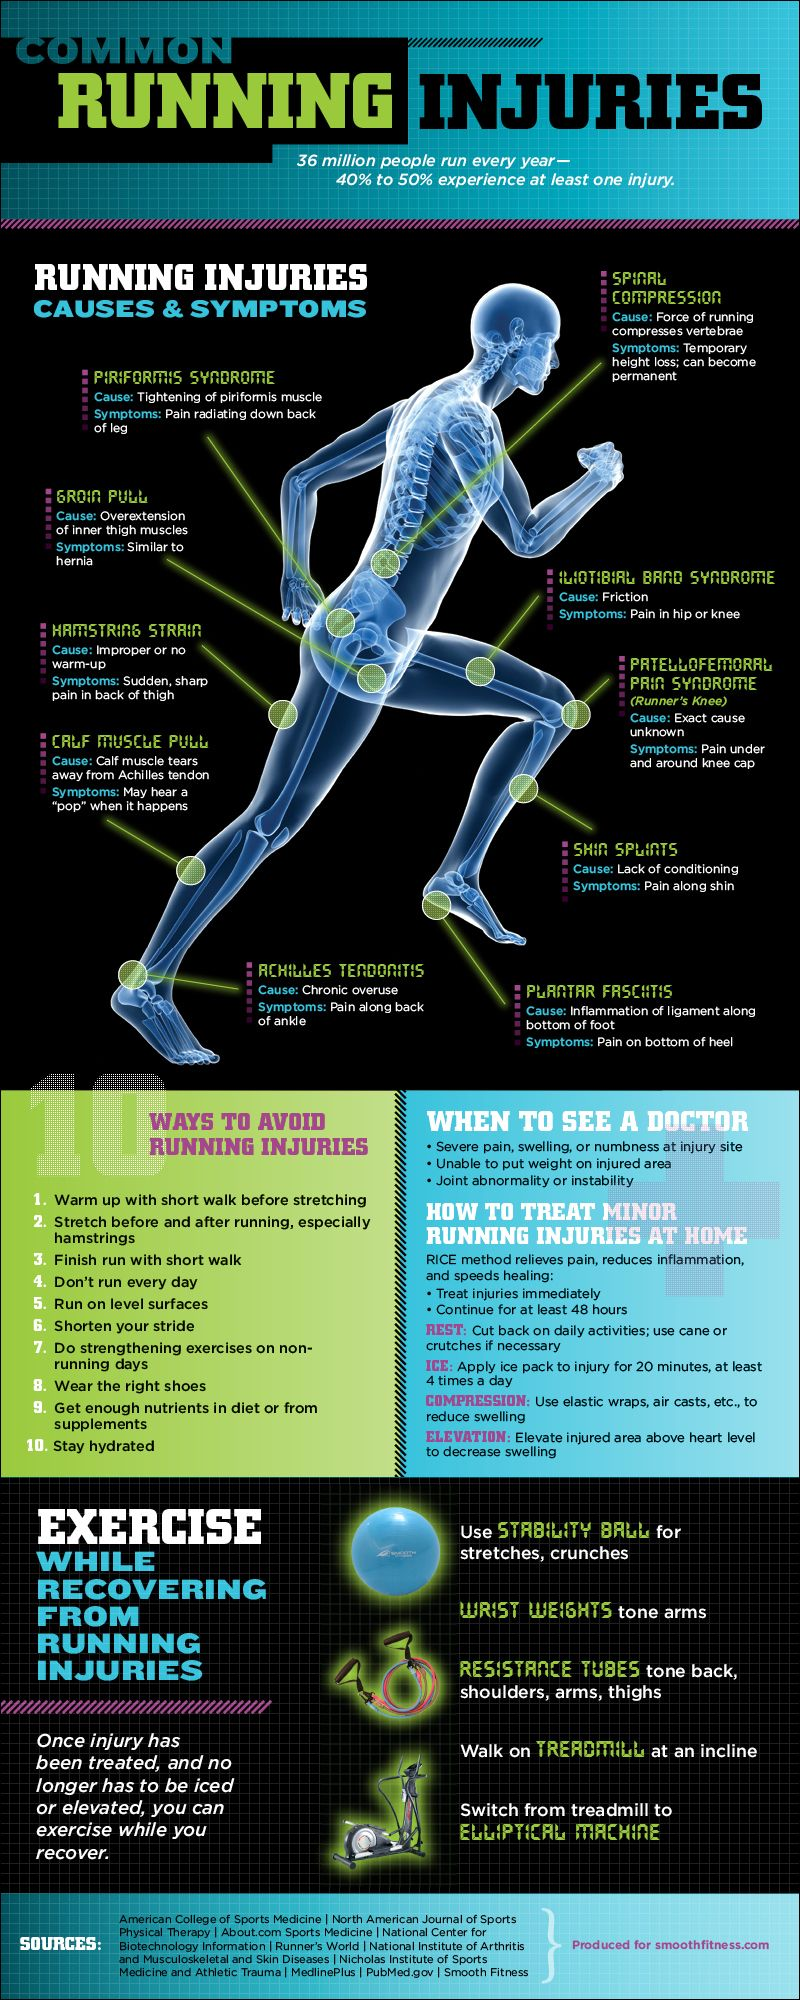 runningDaily Infographic Running injuries, Physical